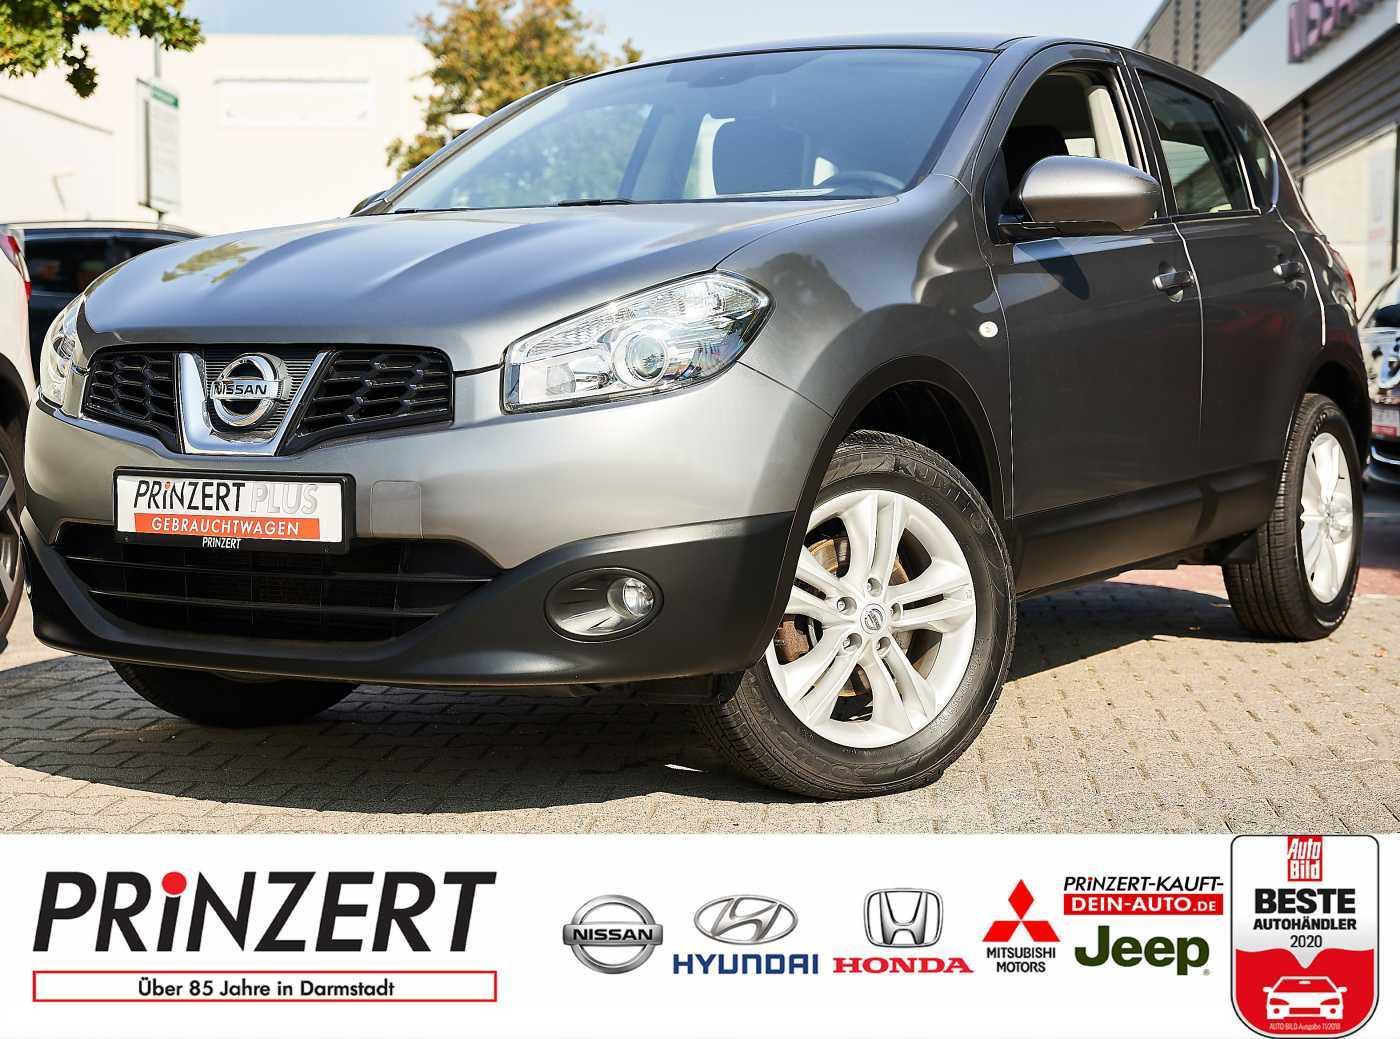 Nissan Qashqai 2.0 MT 'Acenta' Navi, Jahr 2013, Benzin